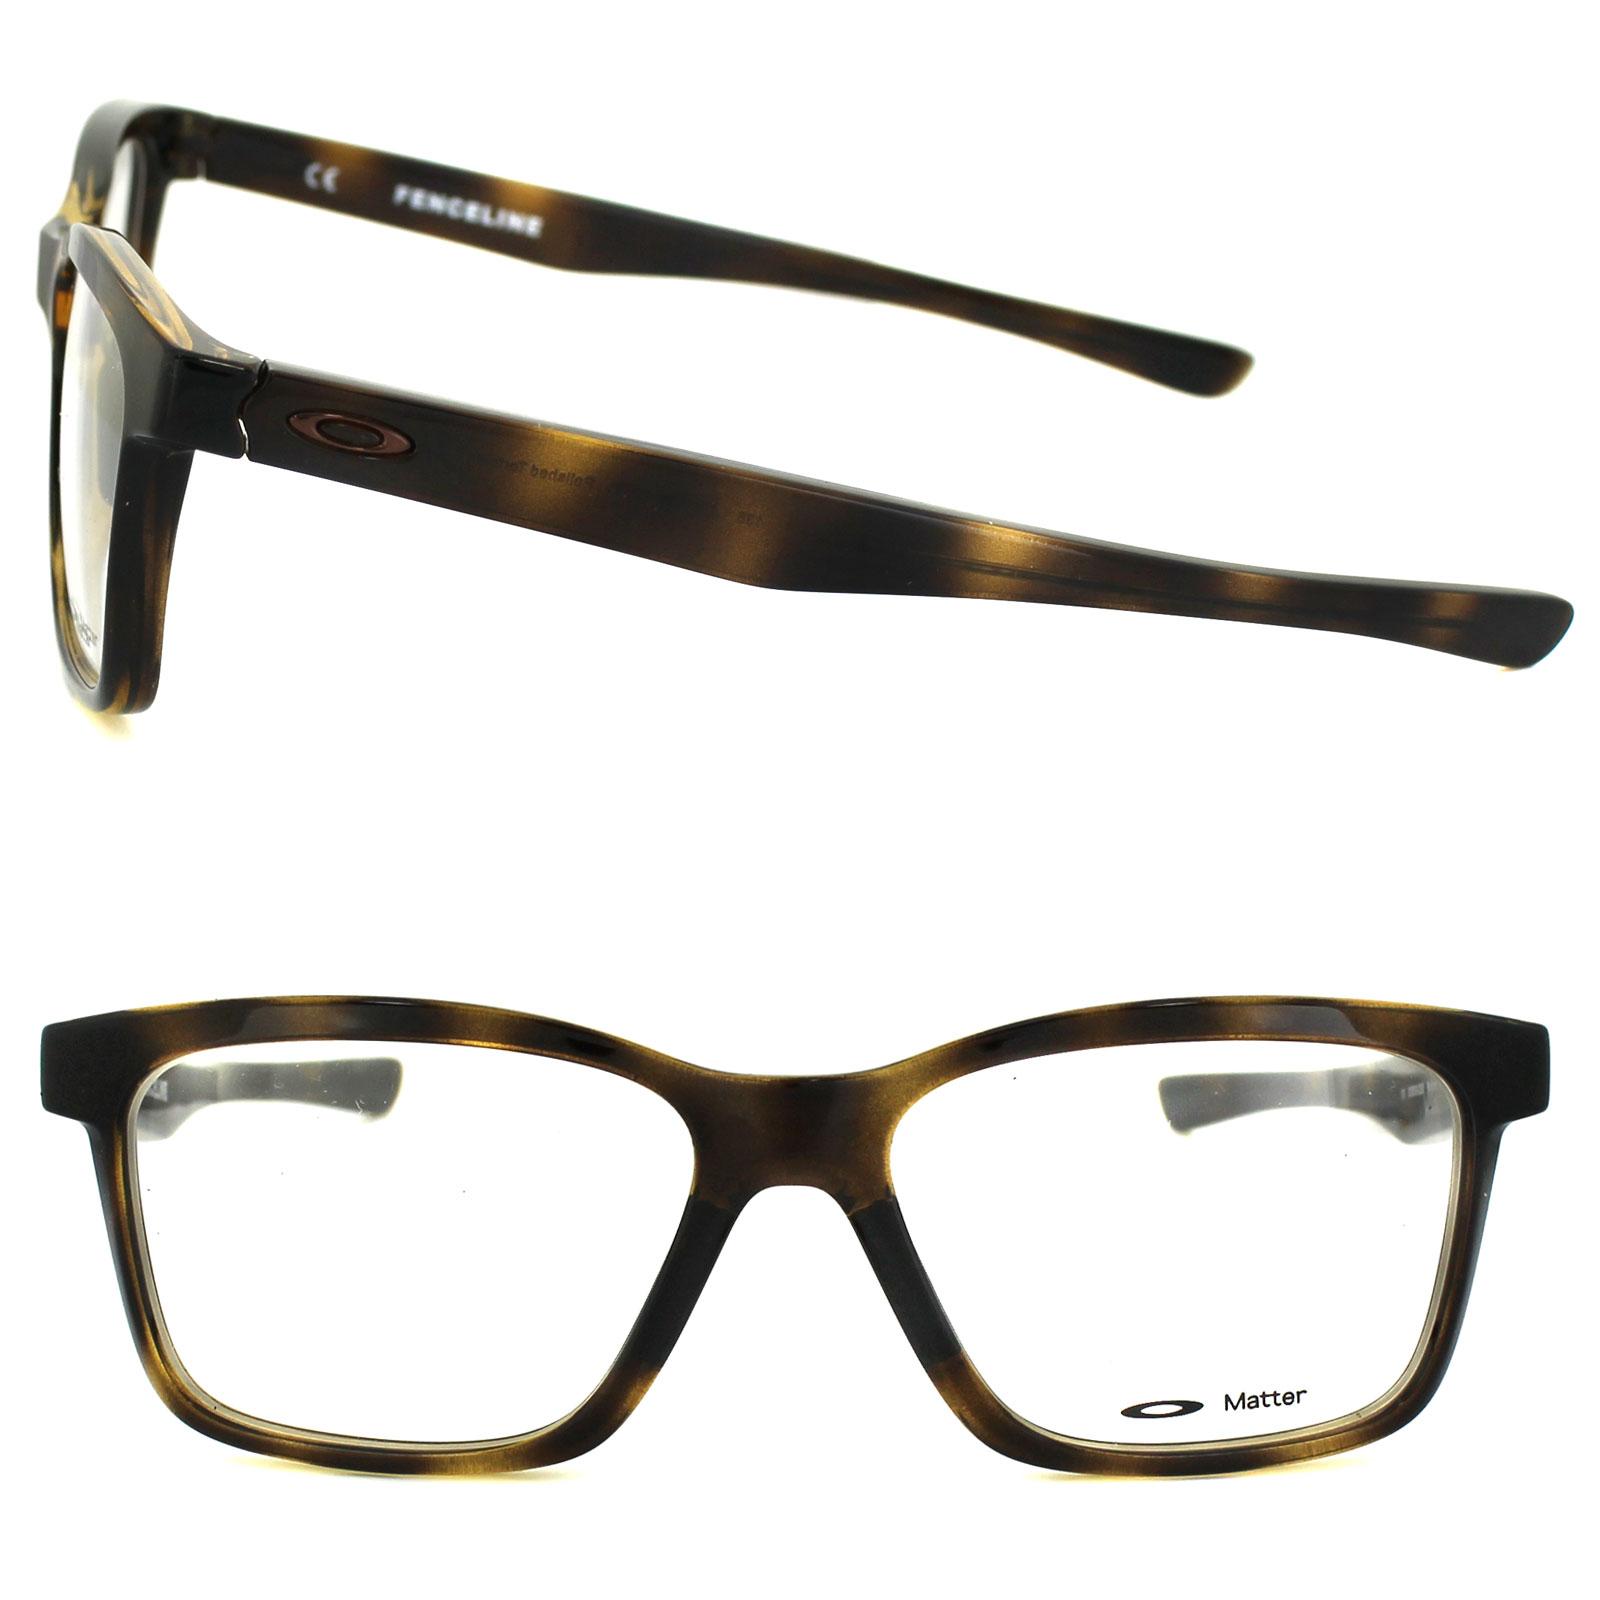 cheap oakley fenceline glasses frames discounted sunglasses